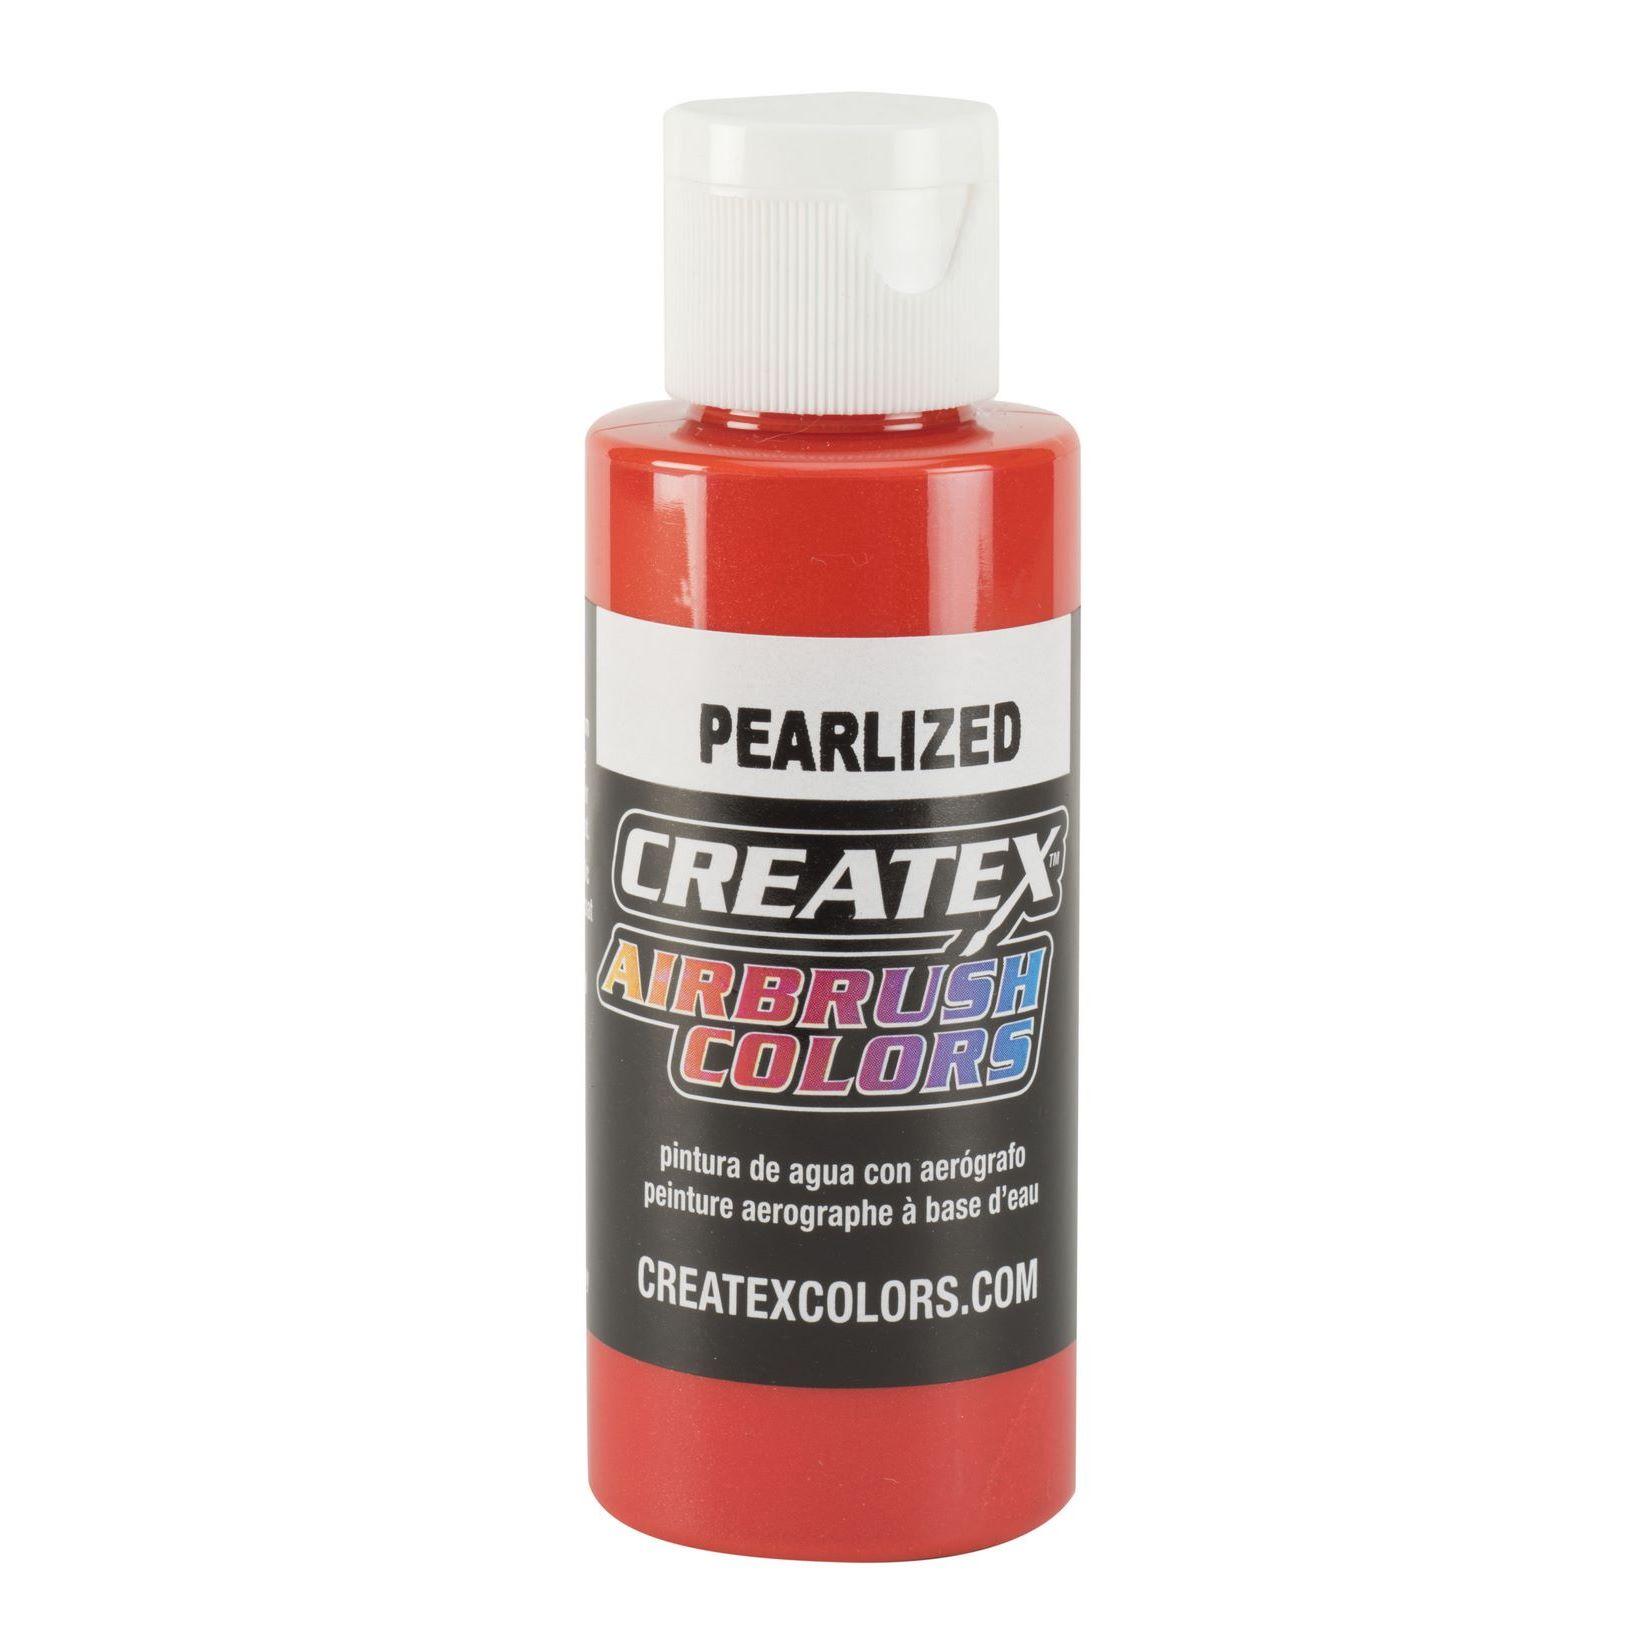 pearl tangerine Createx Airbrush Colors Farbe 60ml 11 5312 Createx